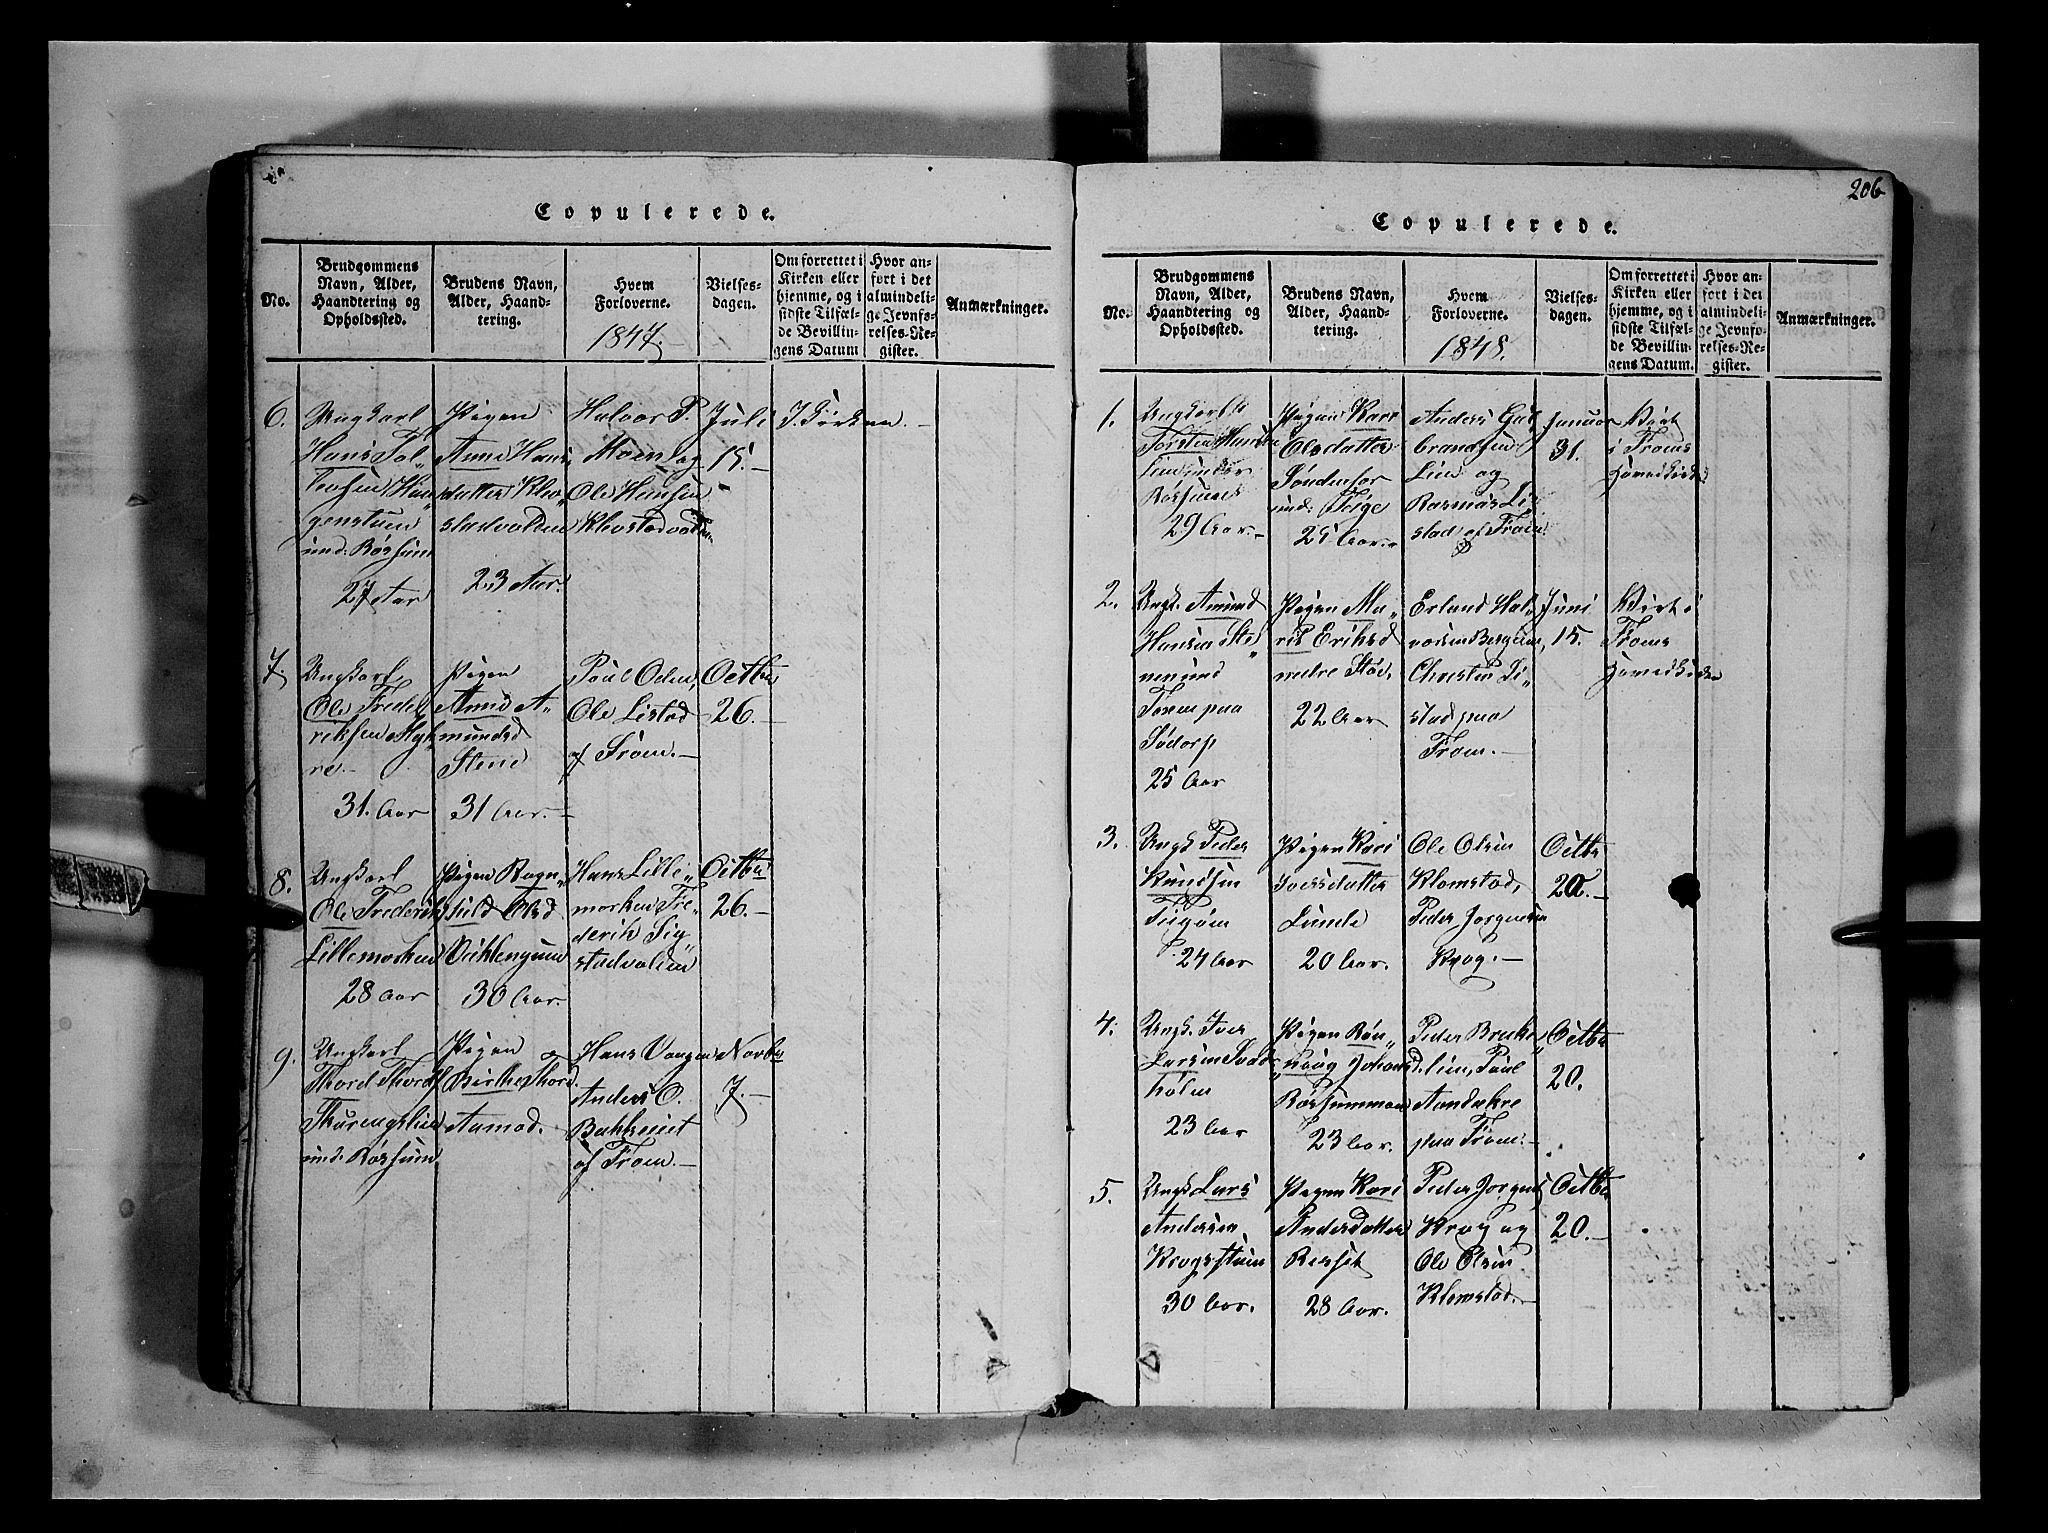 SAH, Fron prestekontor, H/Ha/Hab/L0002: Klokkerbok nr. 2, 1816-1850, s. 206